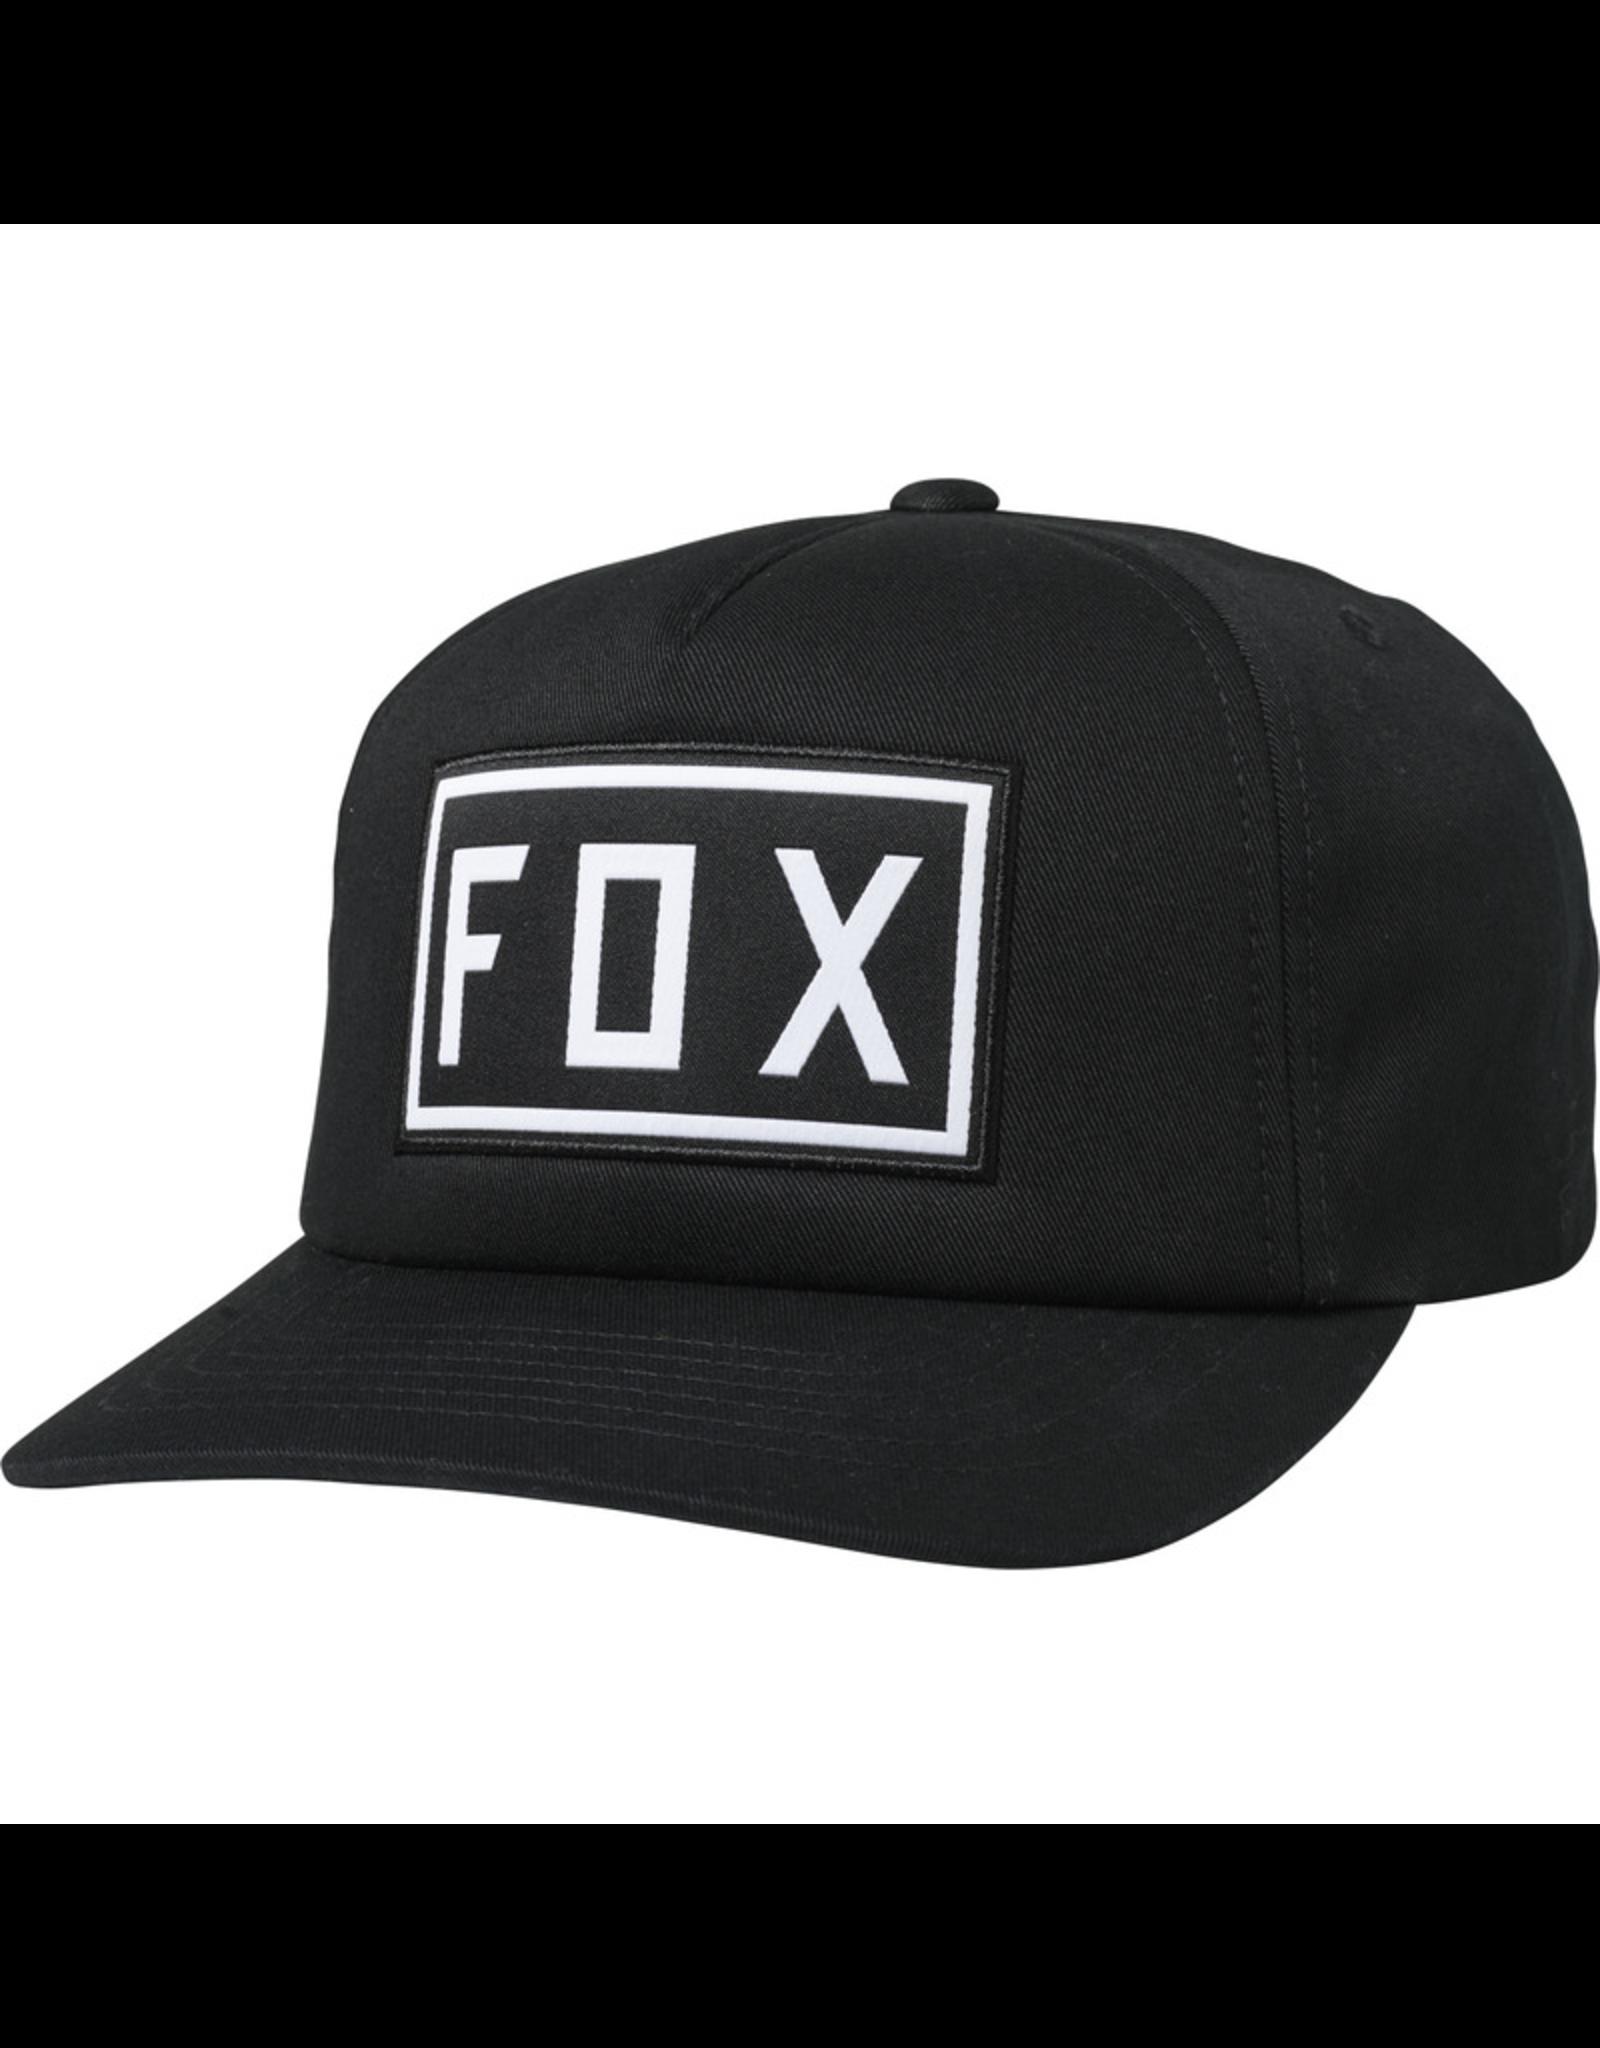 FOX HAT FOX DRIVETRAIN BLACK/BLACK OS SNAPBACK